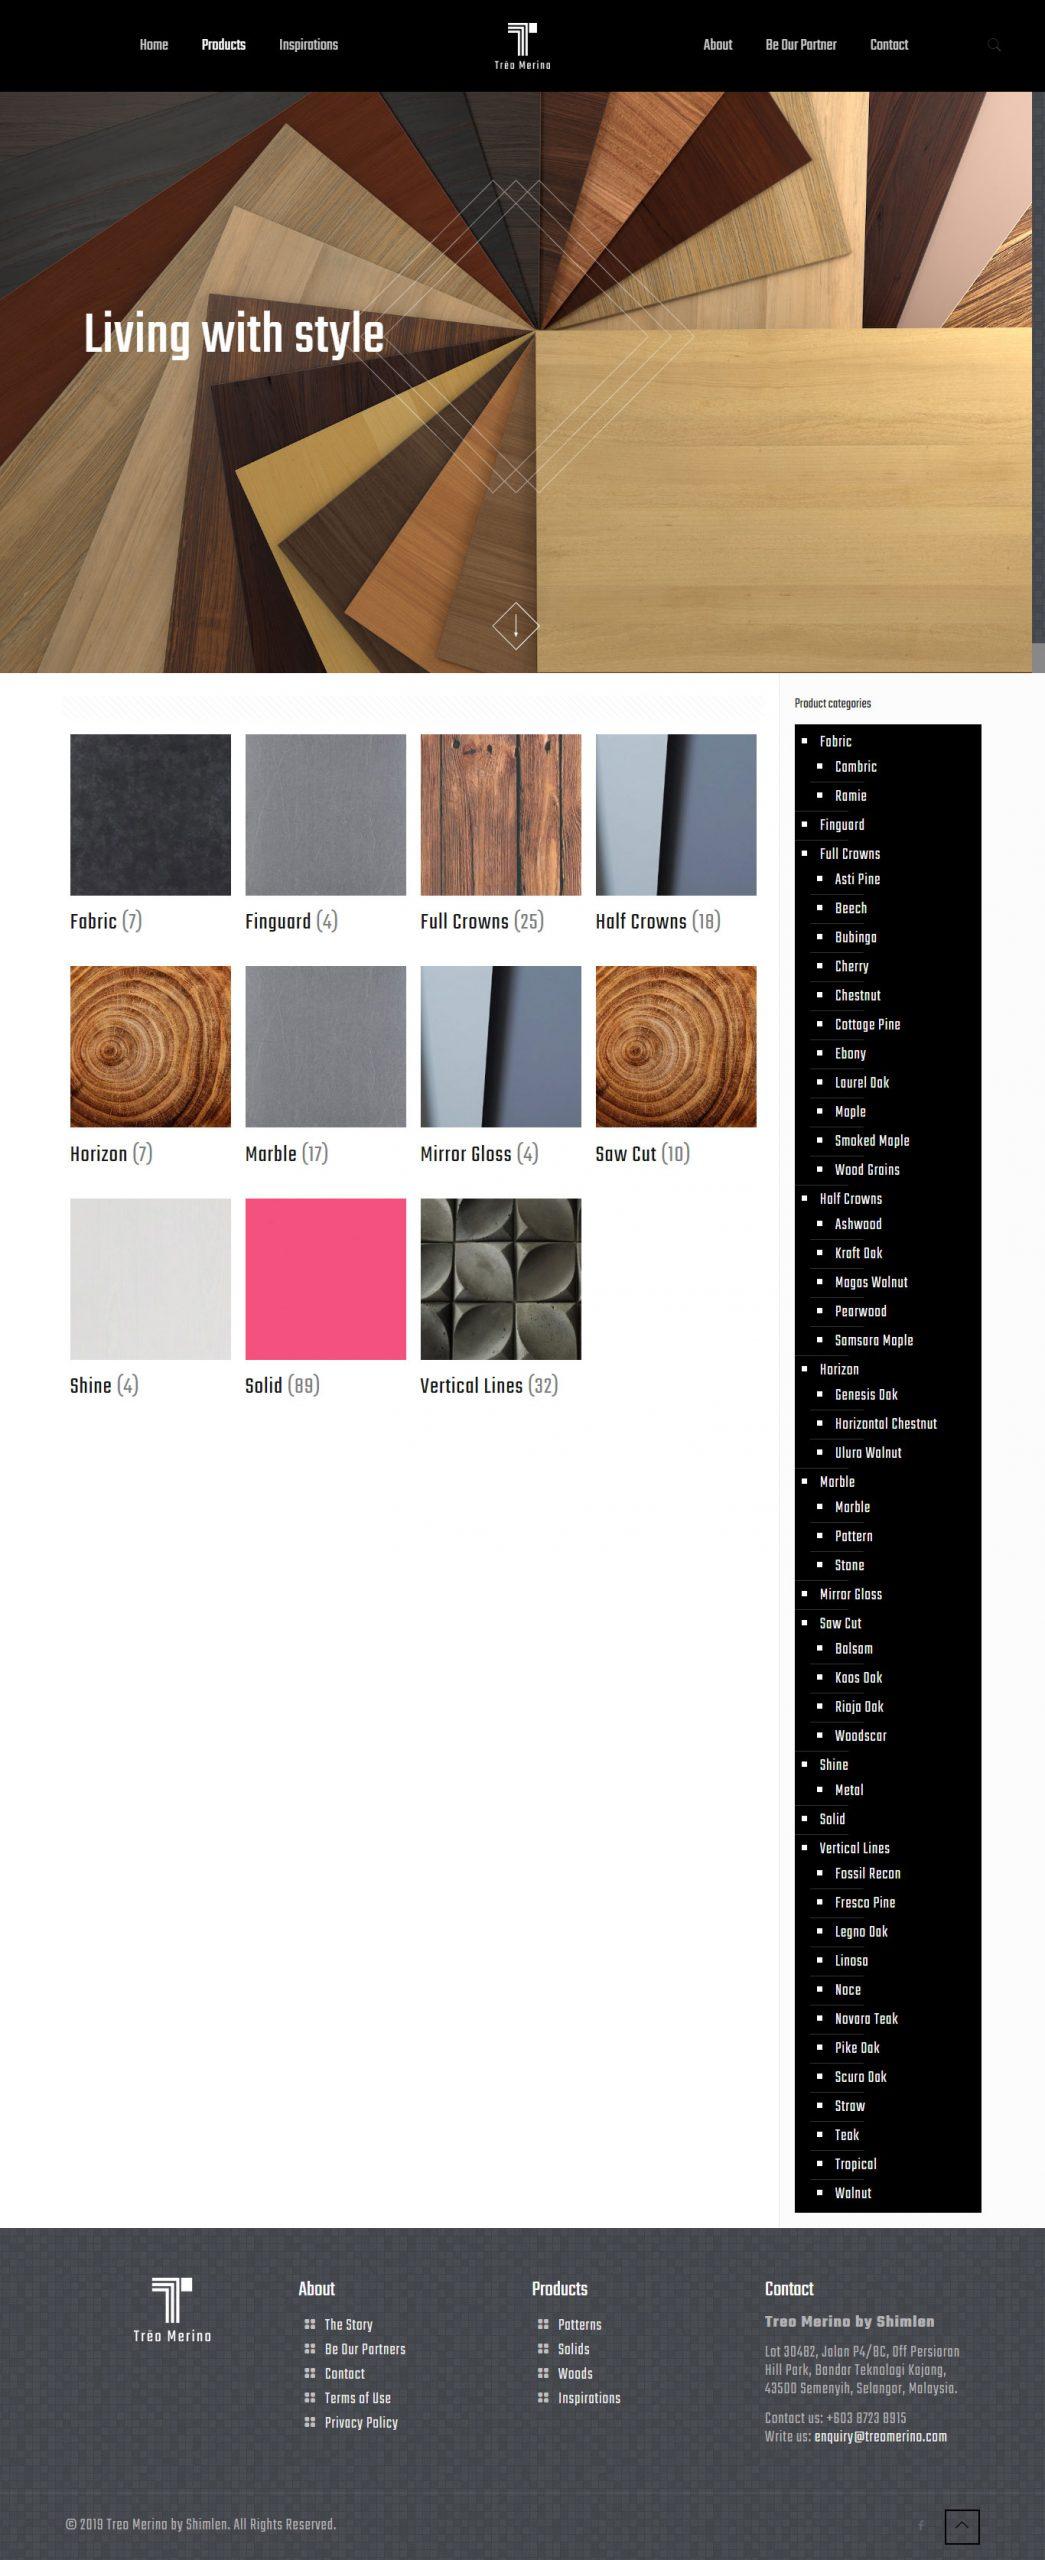 Website Design   Treo Merino